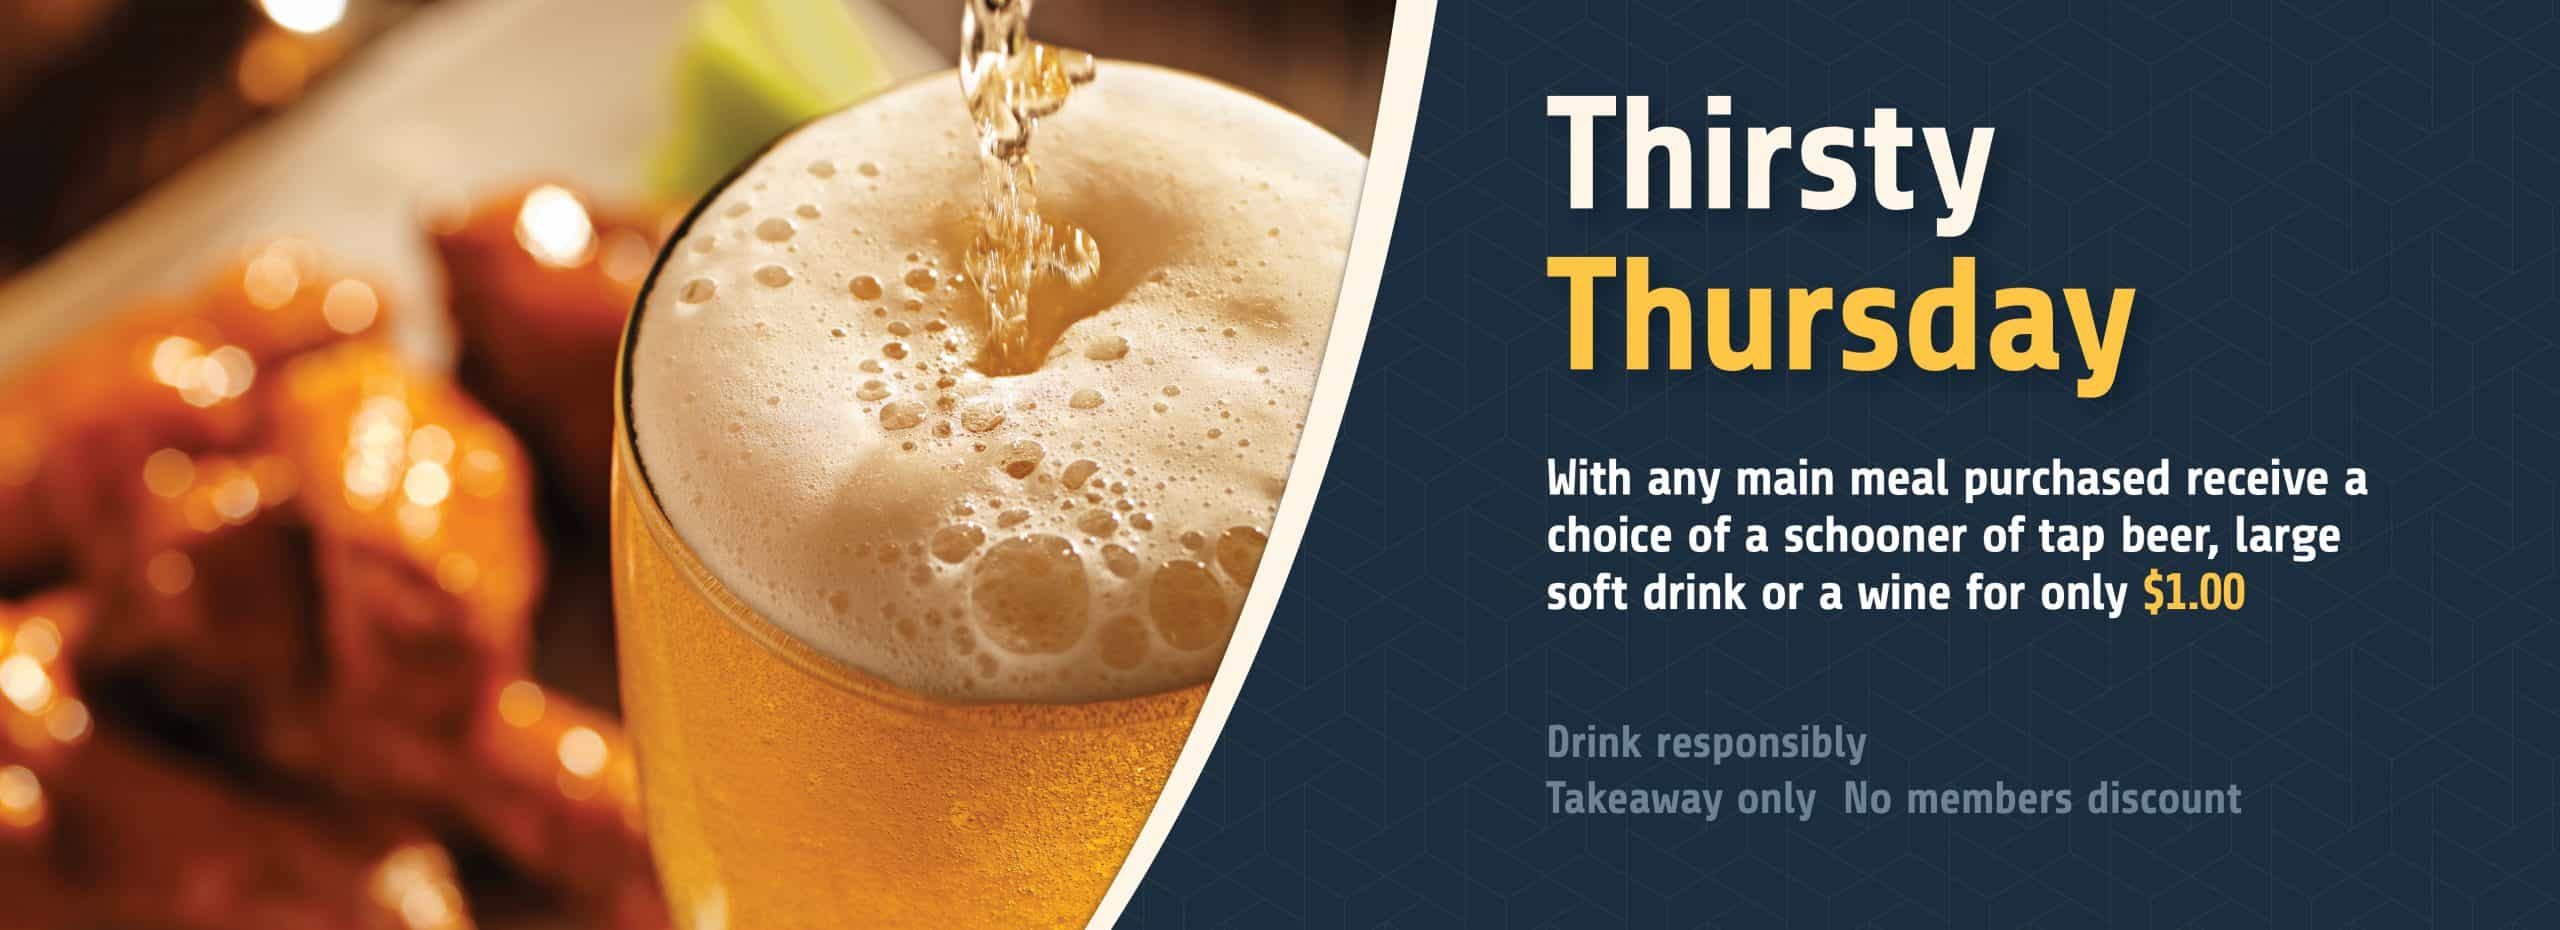 MBC0921-05 Thirsty Thursday - WEB BANNER